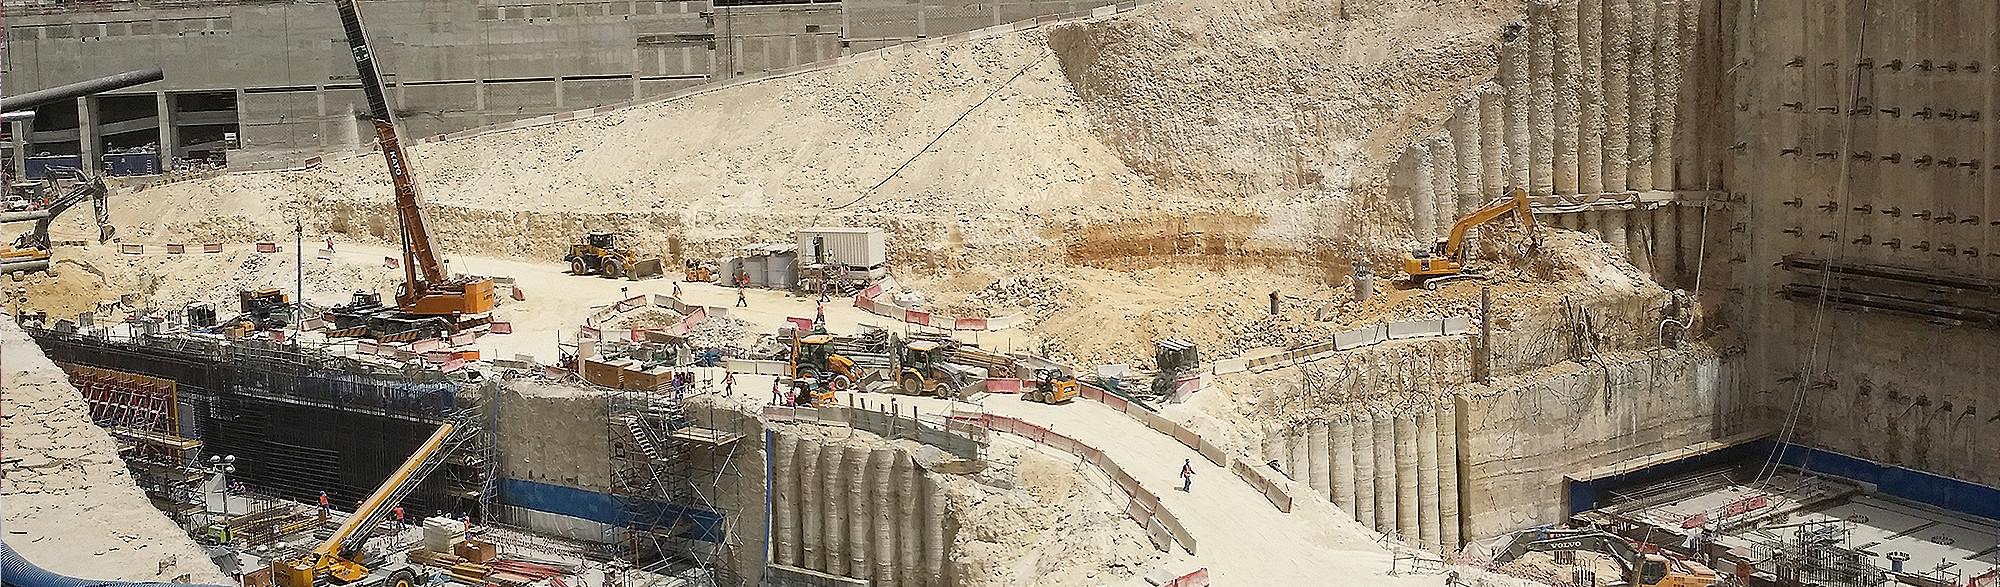 Doha Metro Msheireb Station Rebar Tunneling and Mining - Dextra